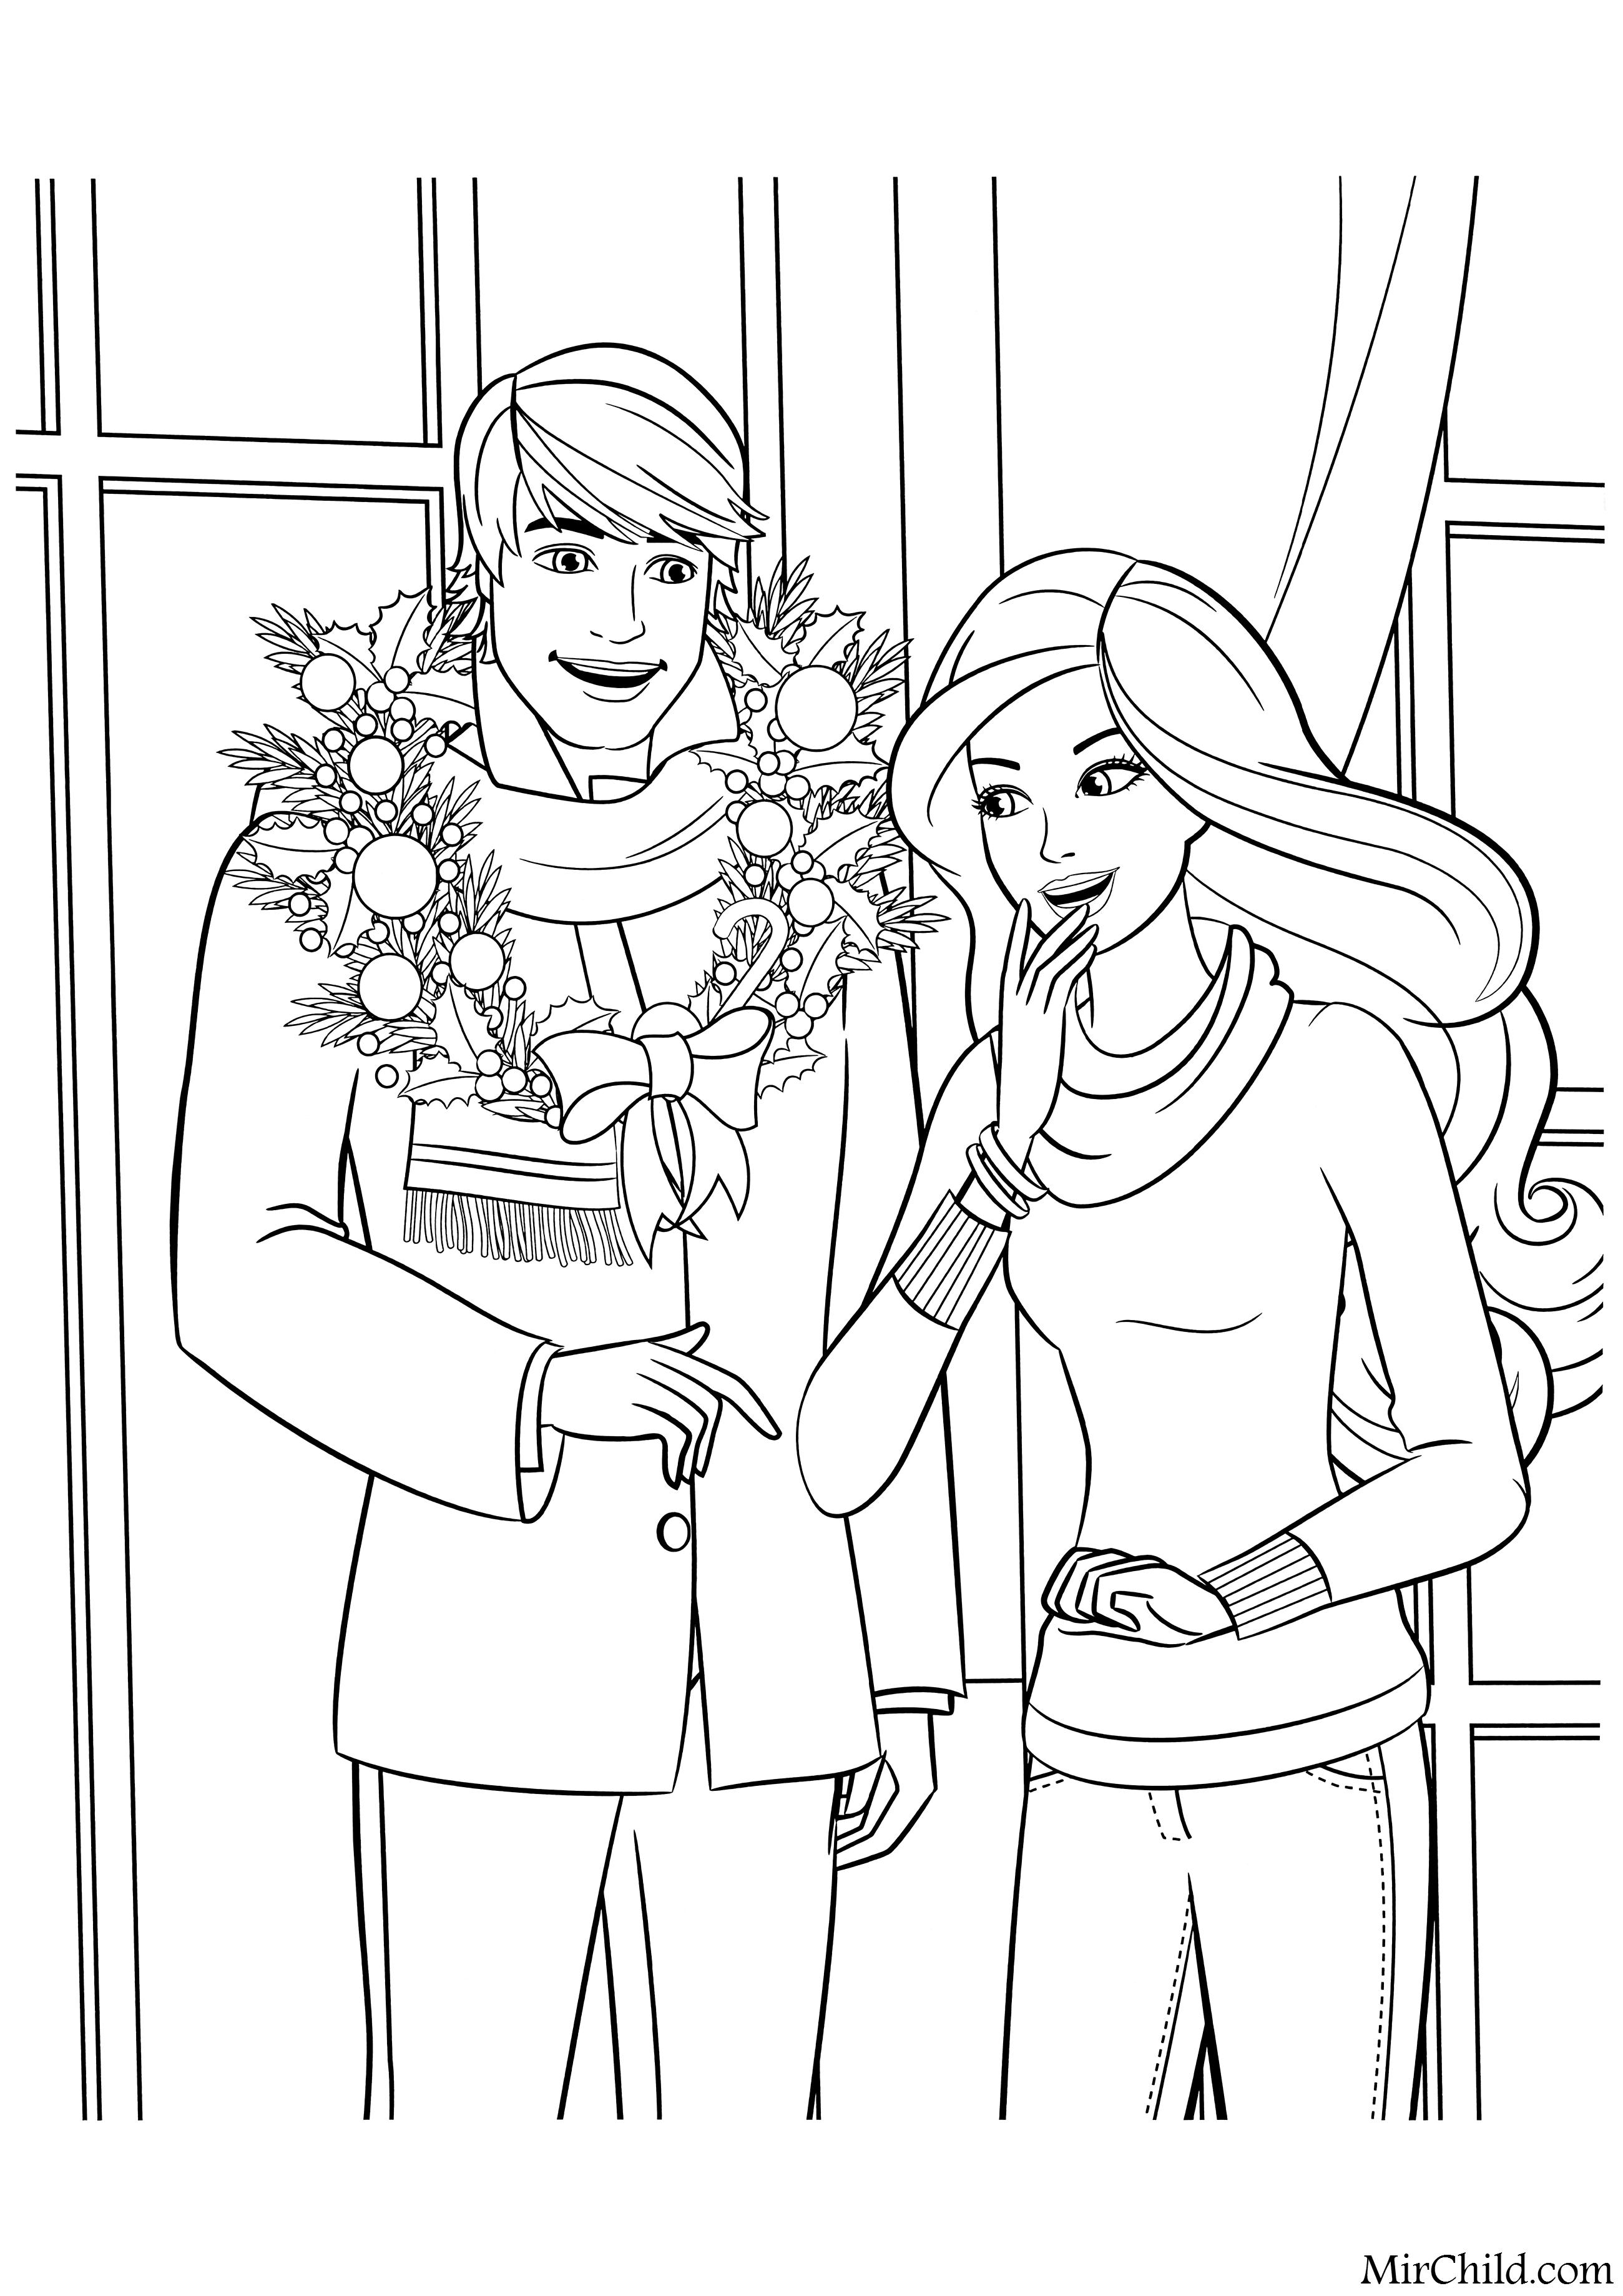 Раскраска - Барби - Кен и Барби | MirChild